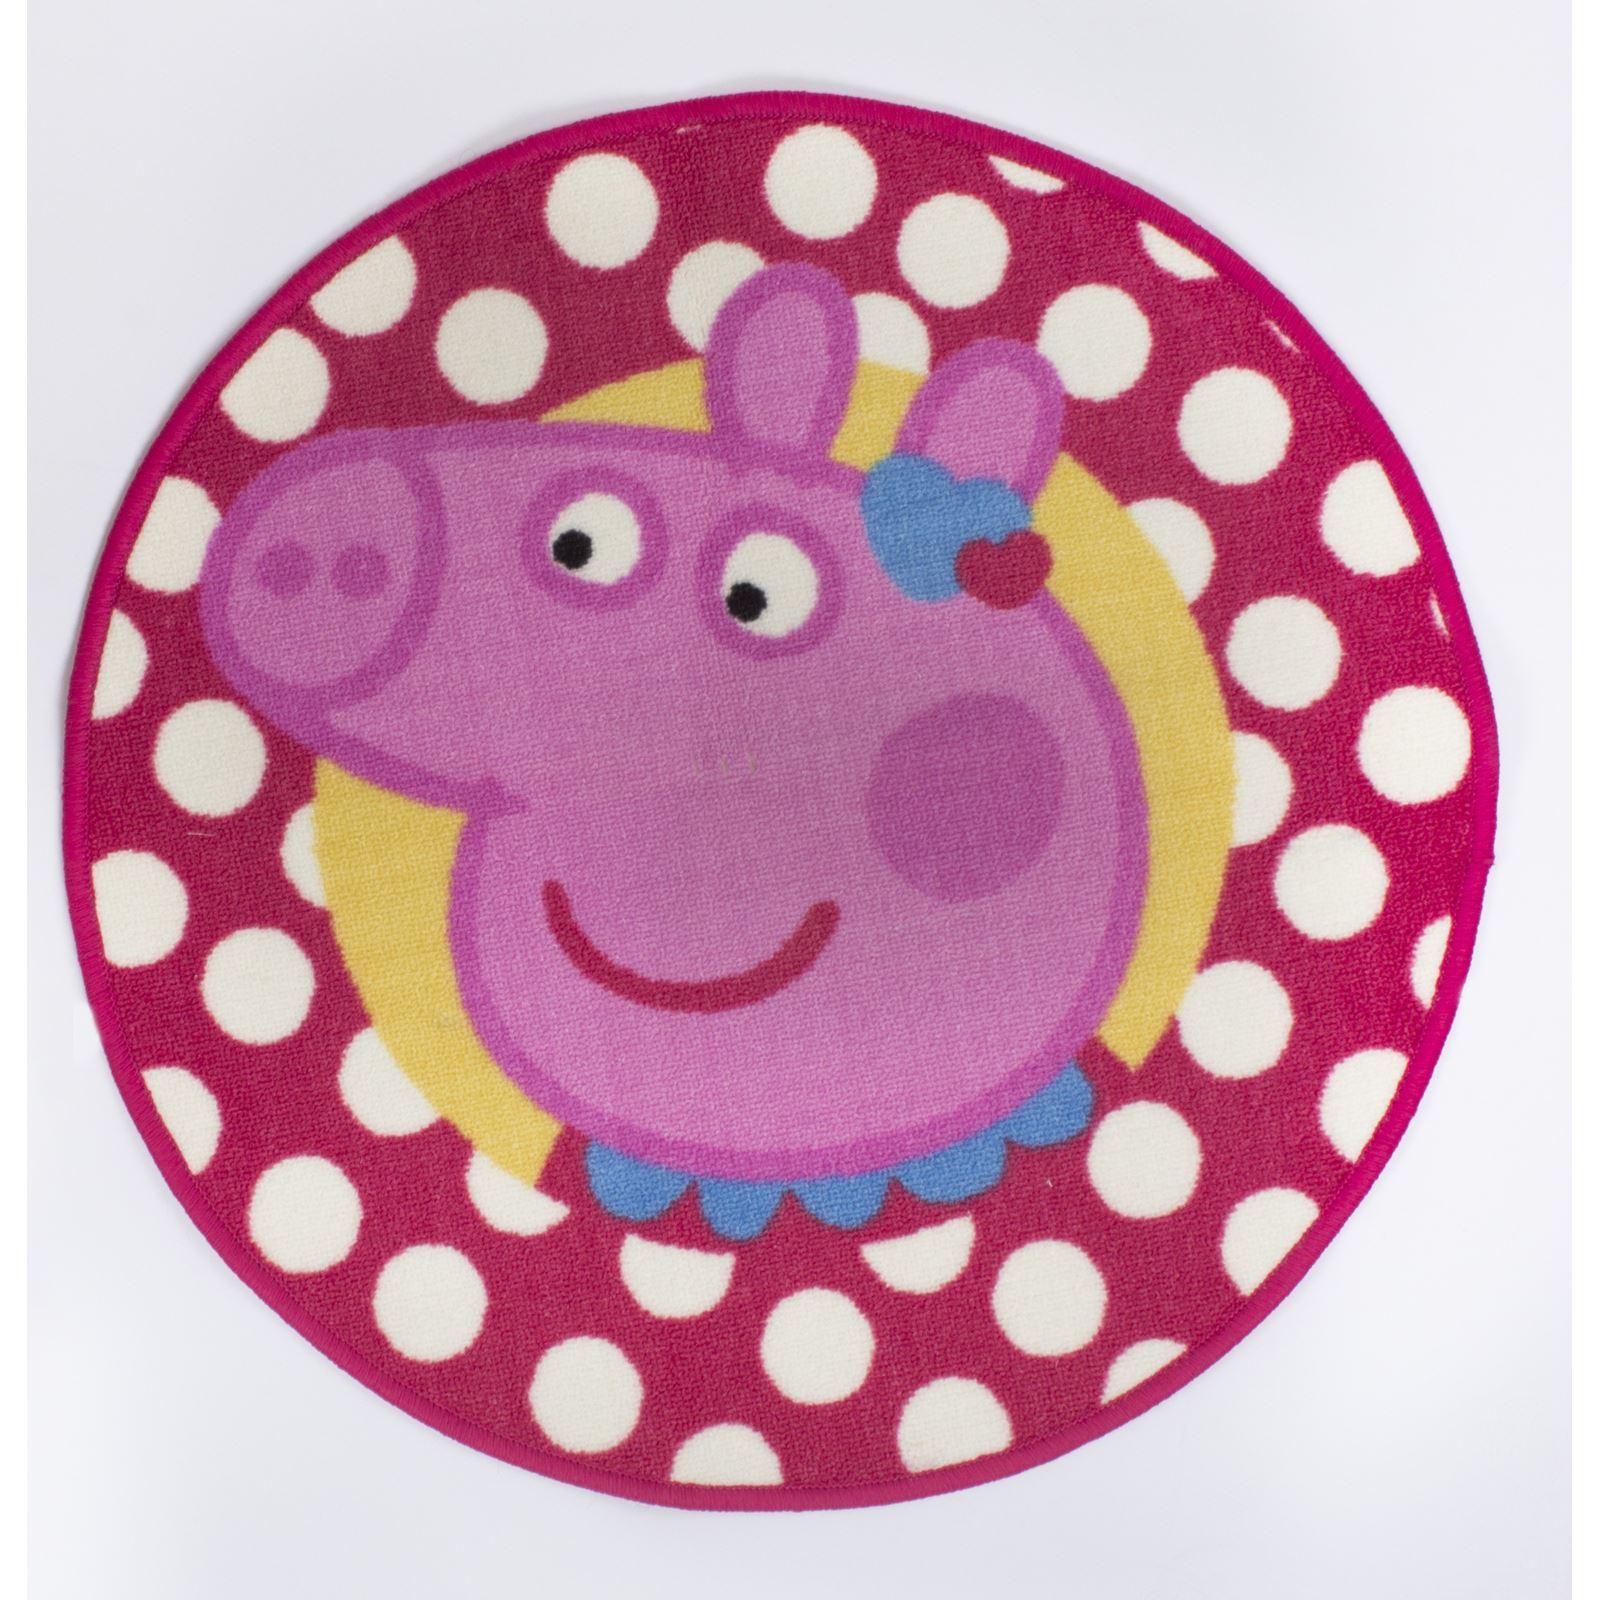 PERSONAJE-INFANTIL-amp-DISNEY-SUELO-ALFOMBRAS-PEPPA-PIG-POKEMON-THOMAS-MINIONS